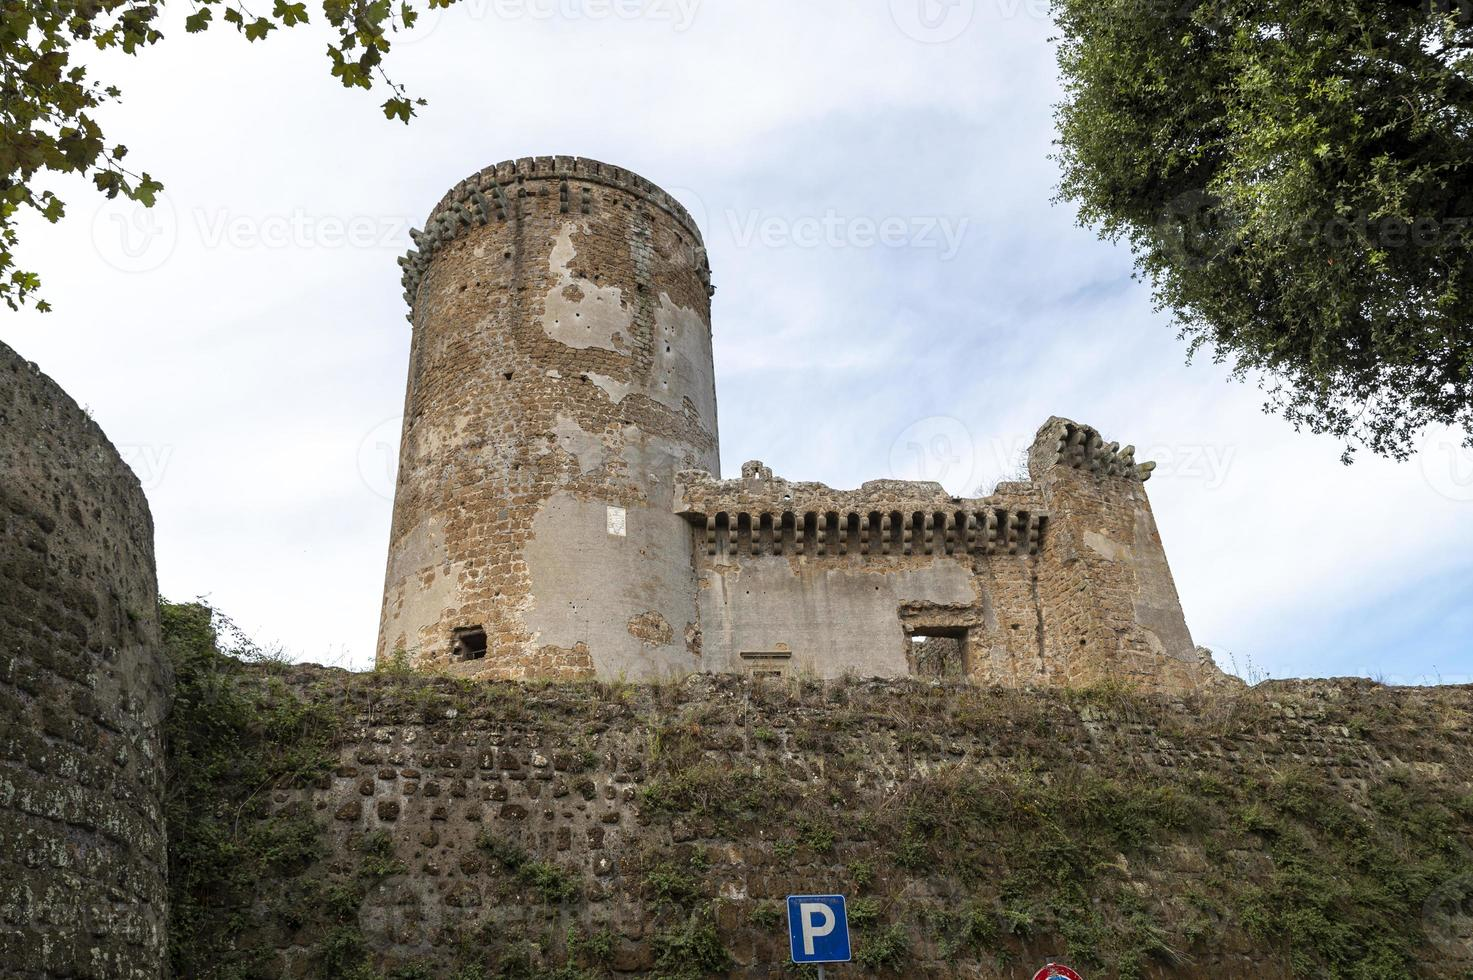 Borgia Castle in the town of Nepi, Italy, 2020 photo